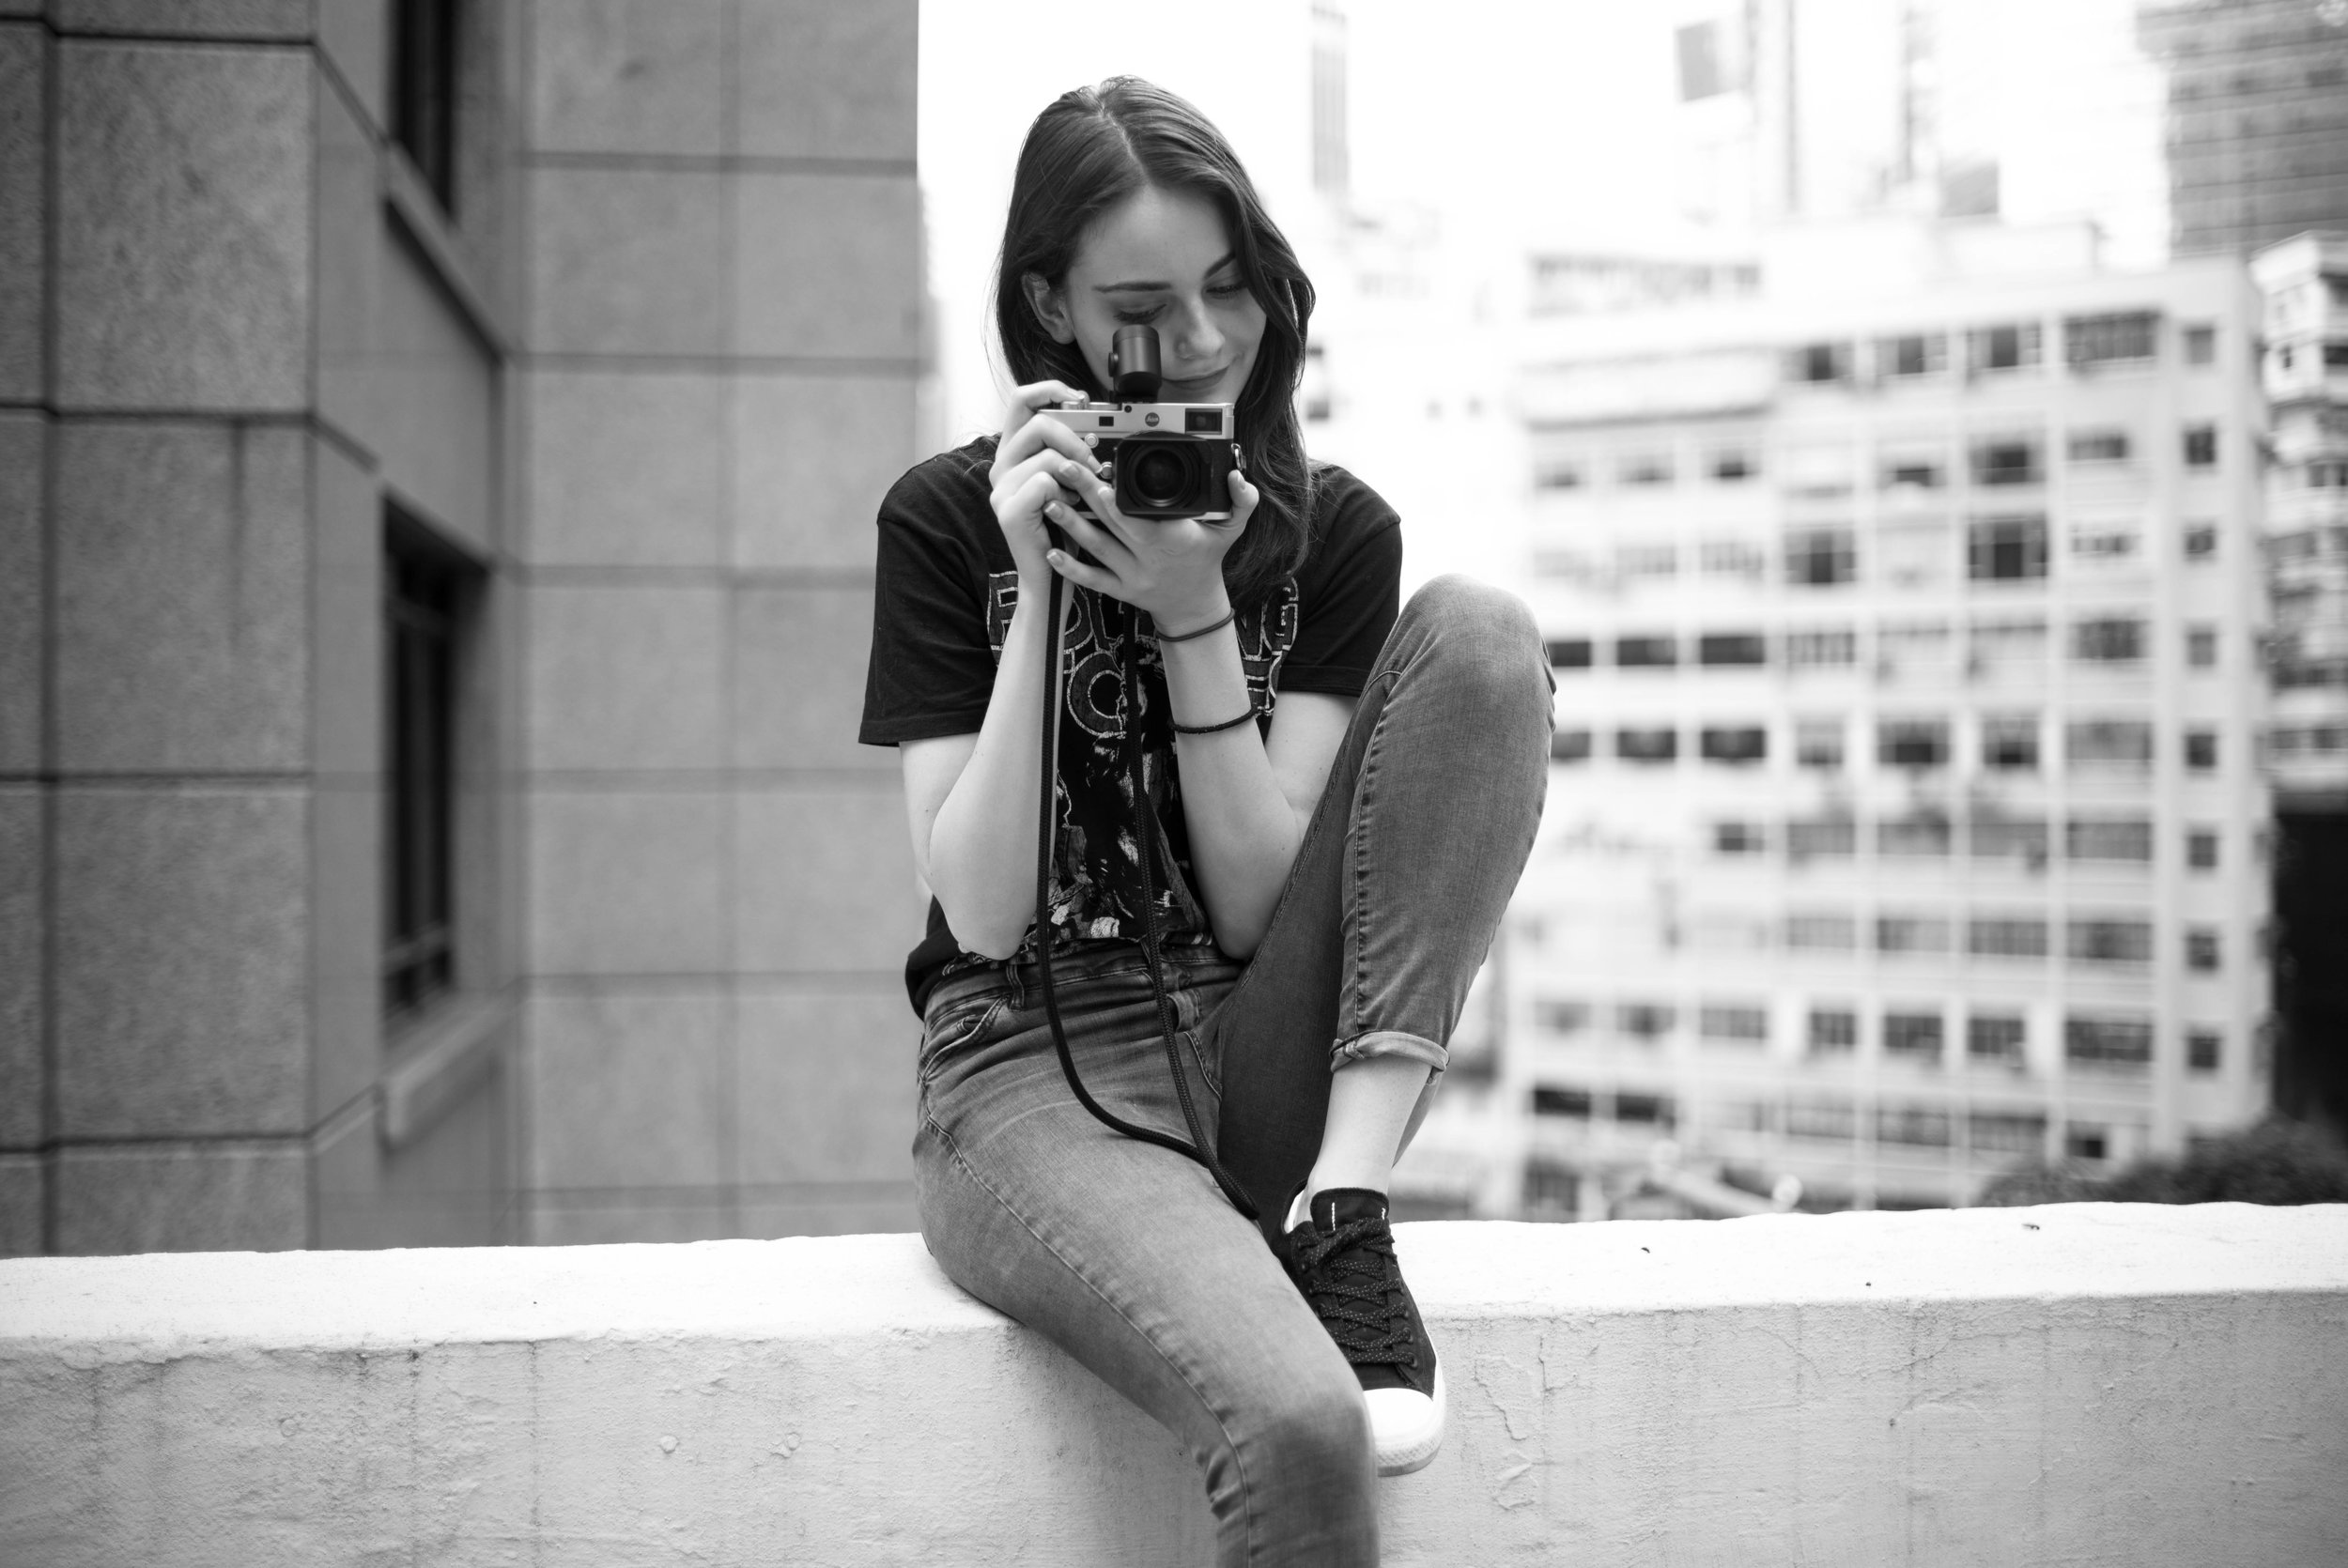 Leica M246 + EVF 2 + 35mm f/1.4 Summilux-M ASPH FLE